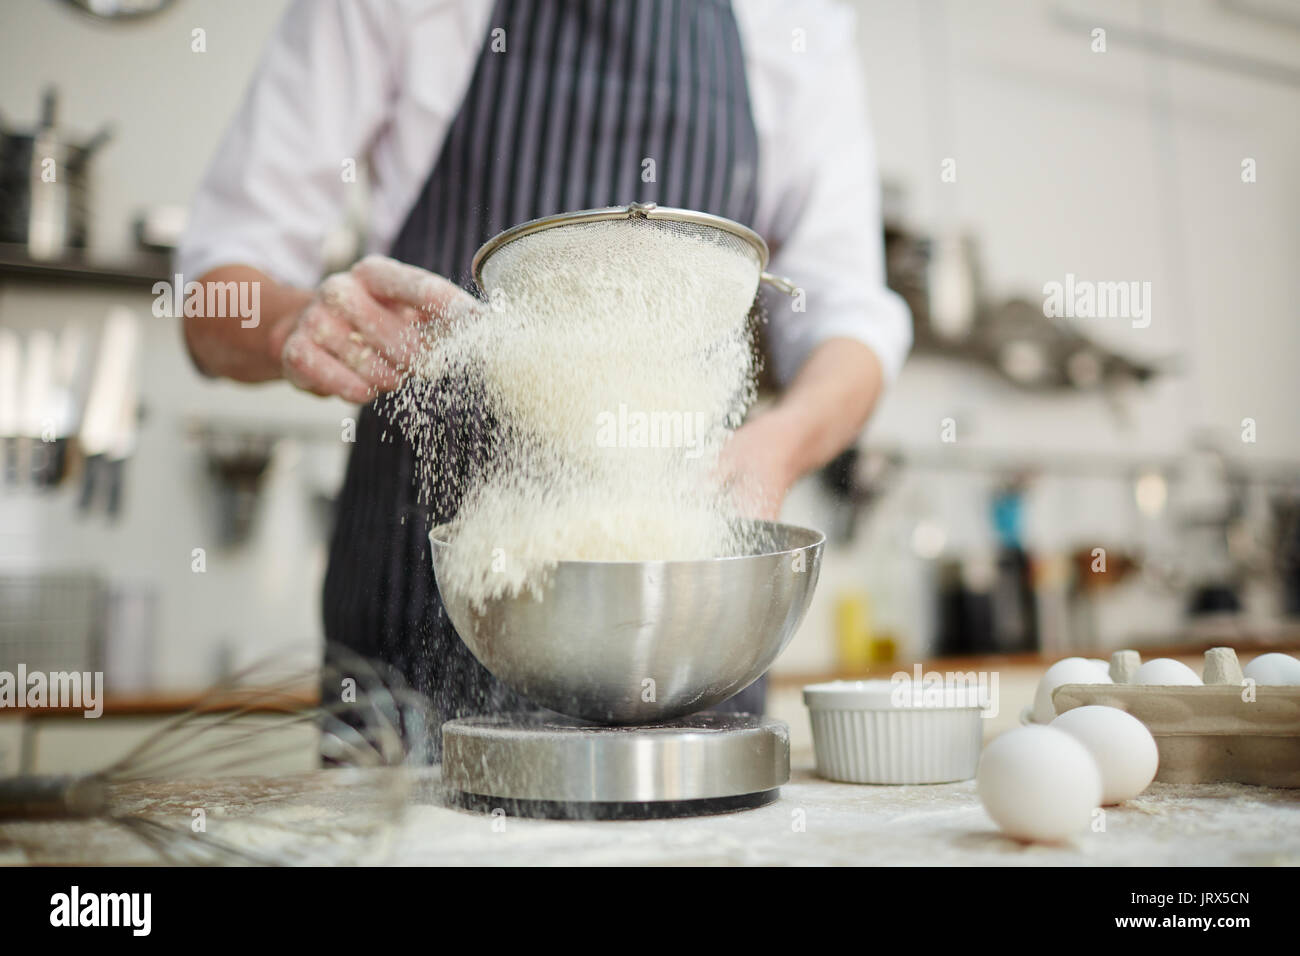 Flour for dough - Stock Image